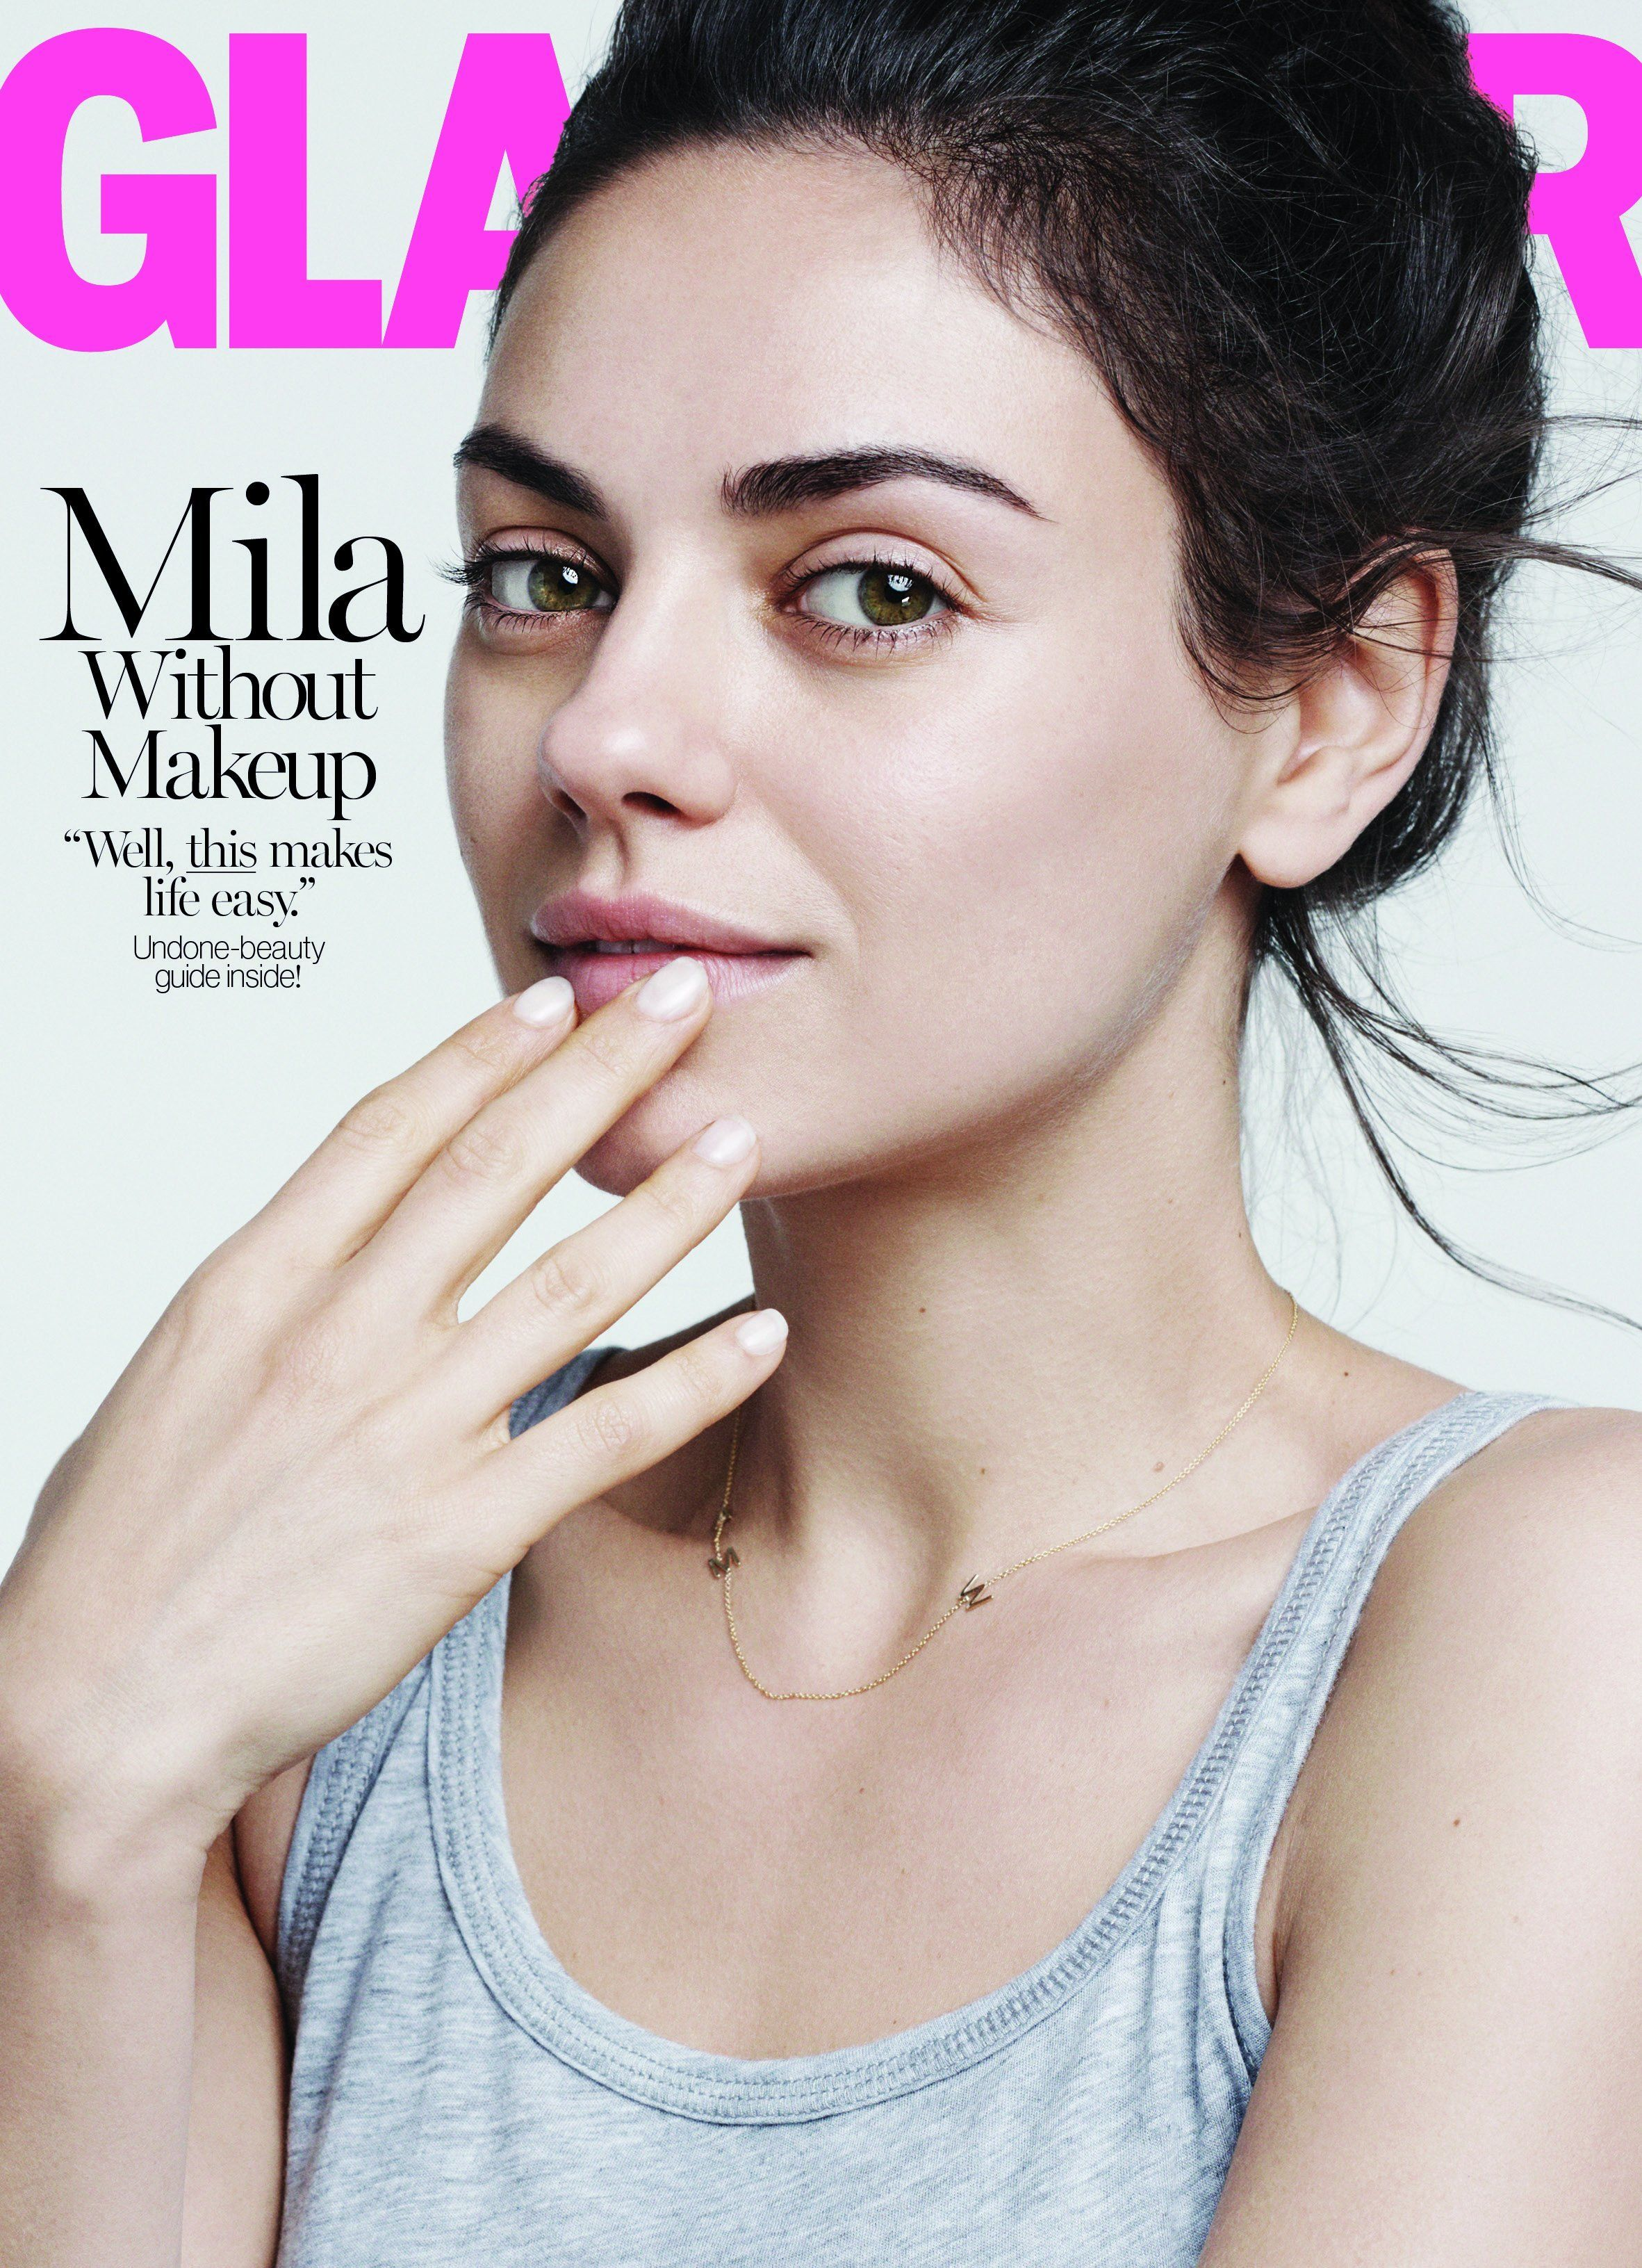 Mila Kunis Poses Makeup-Free, Slams